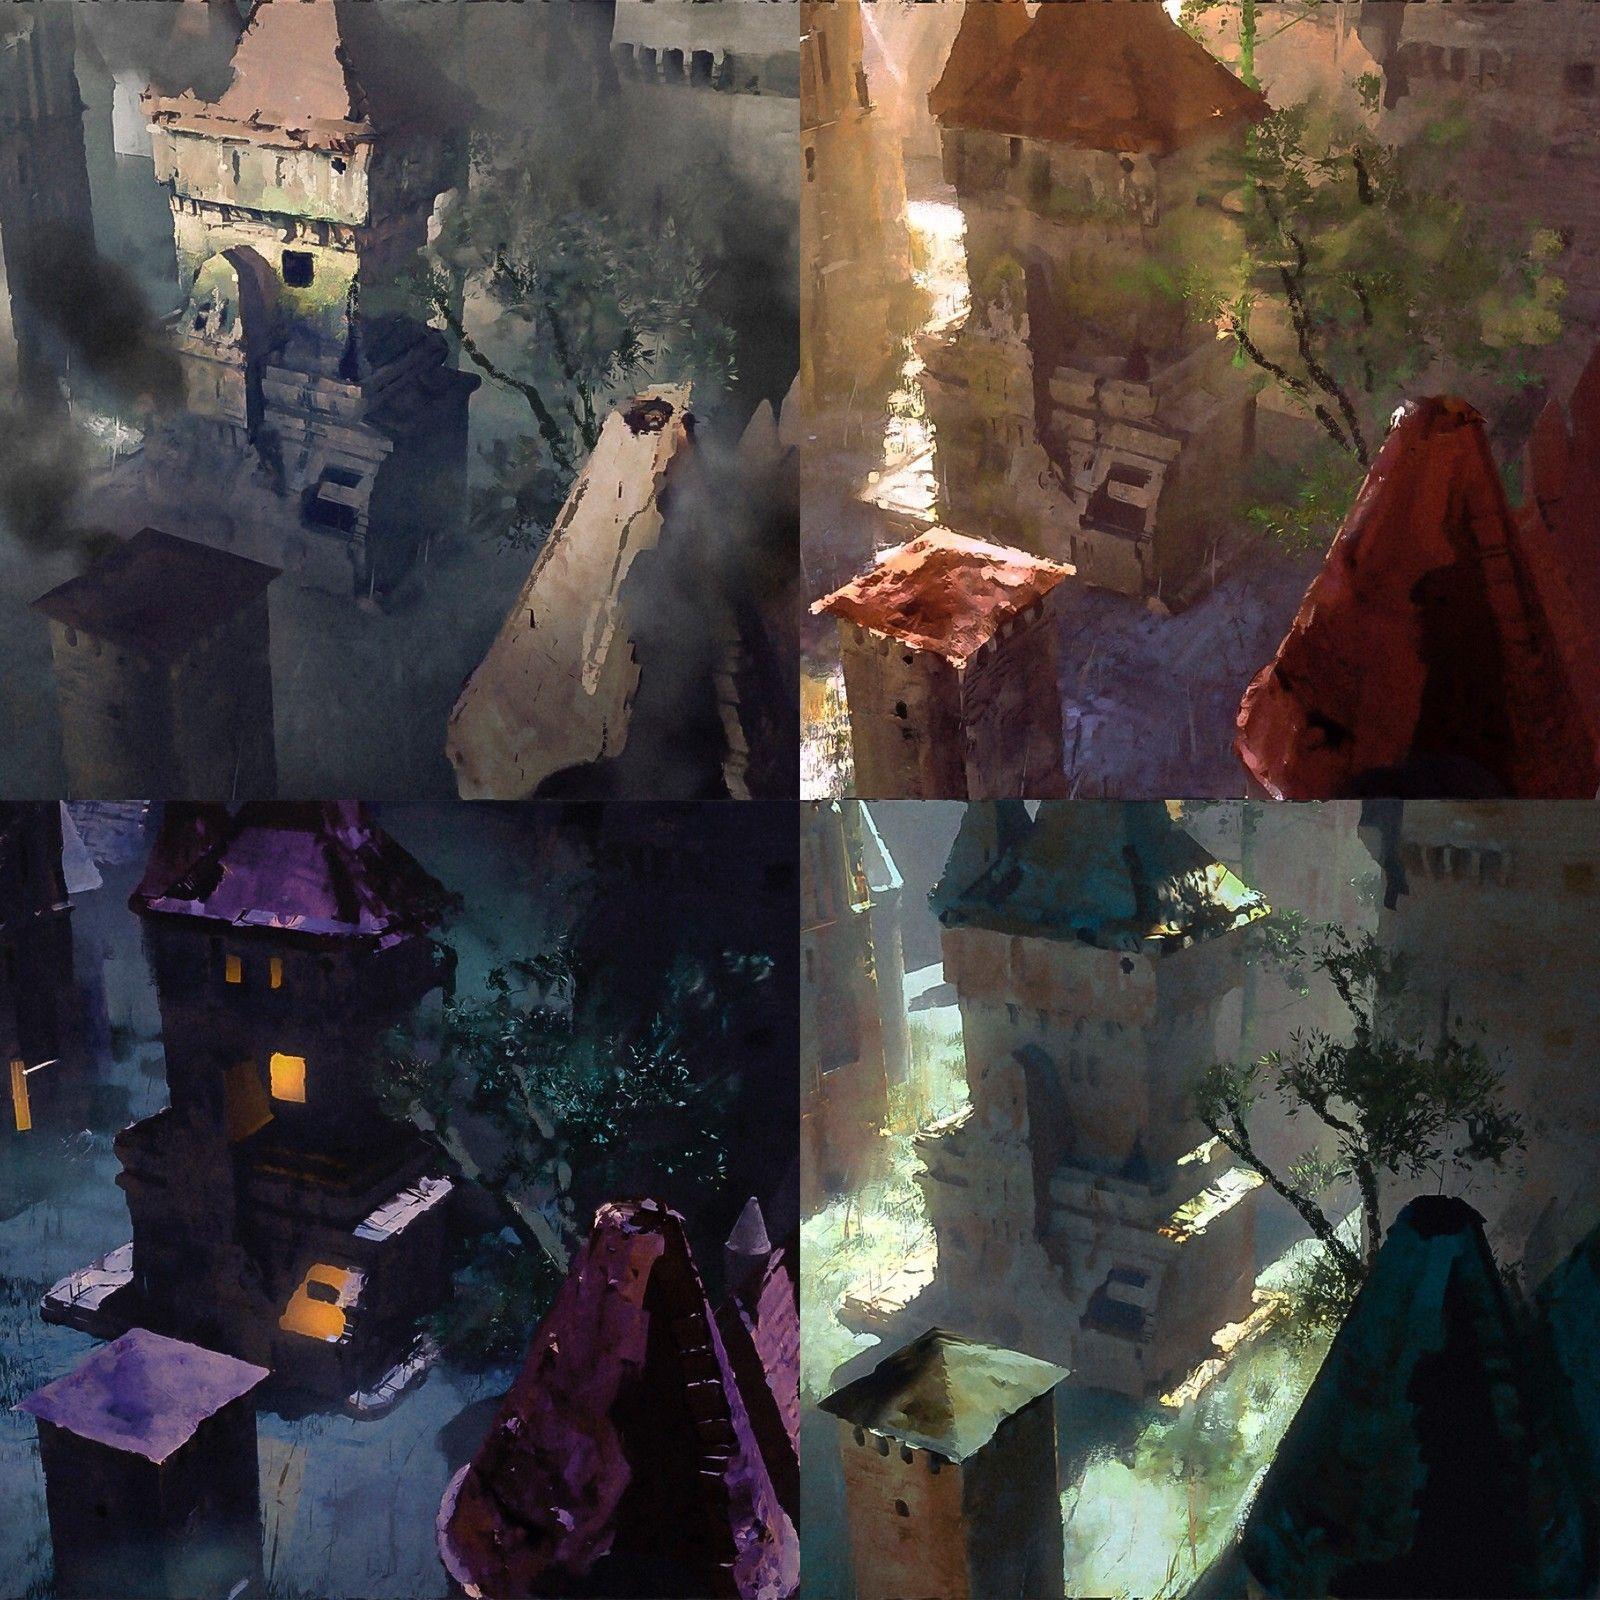 Narrative Light and Color - Medieval Ruins - Part 1, Stéphane (Wootha) Richard on ArtStation at https://www.artstation.com/artwork/DB61o